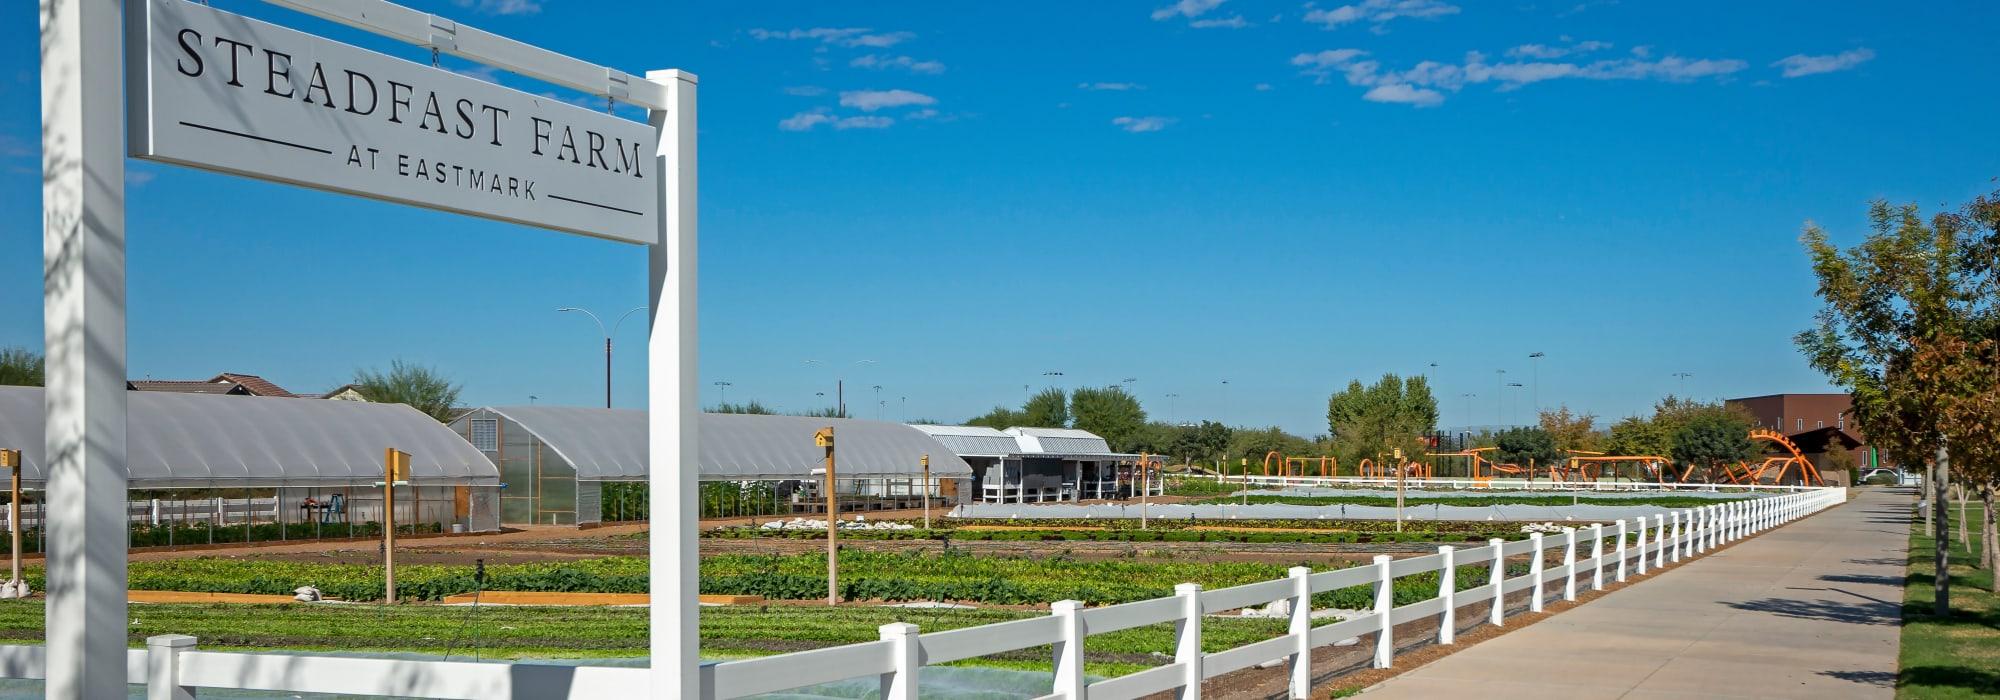 Steadfast Farm near BB Living at Eastmark in Mesa, Arizona